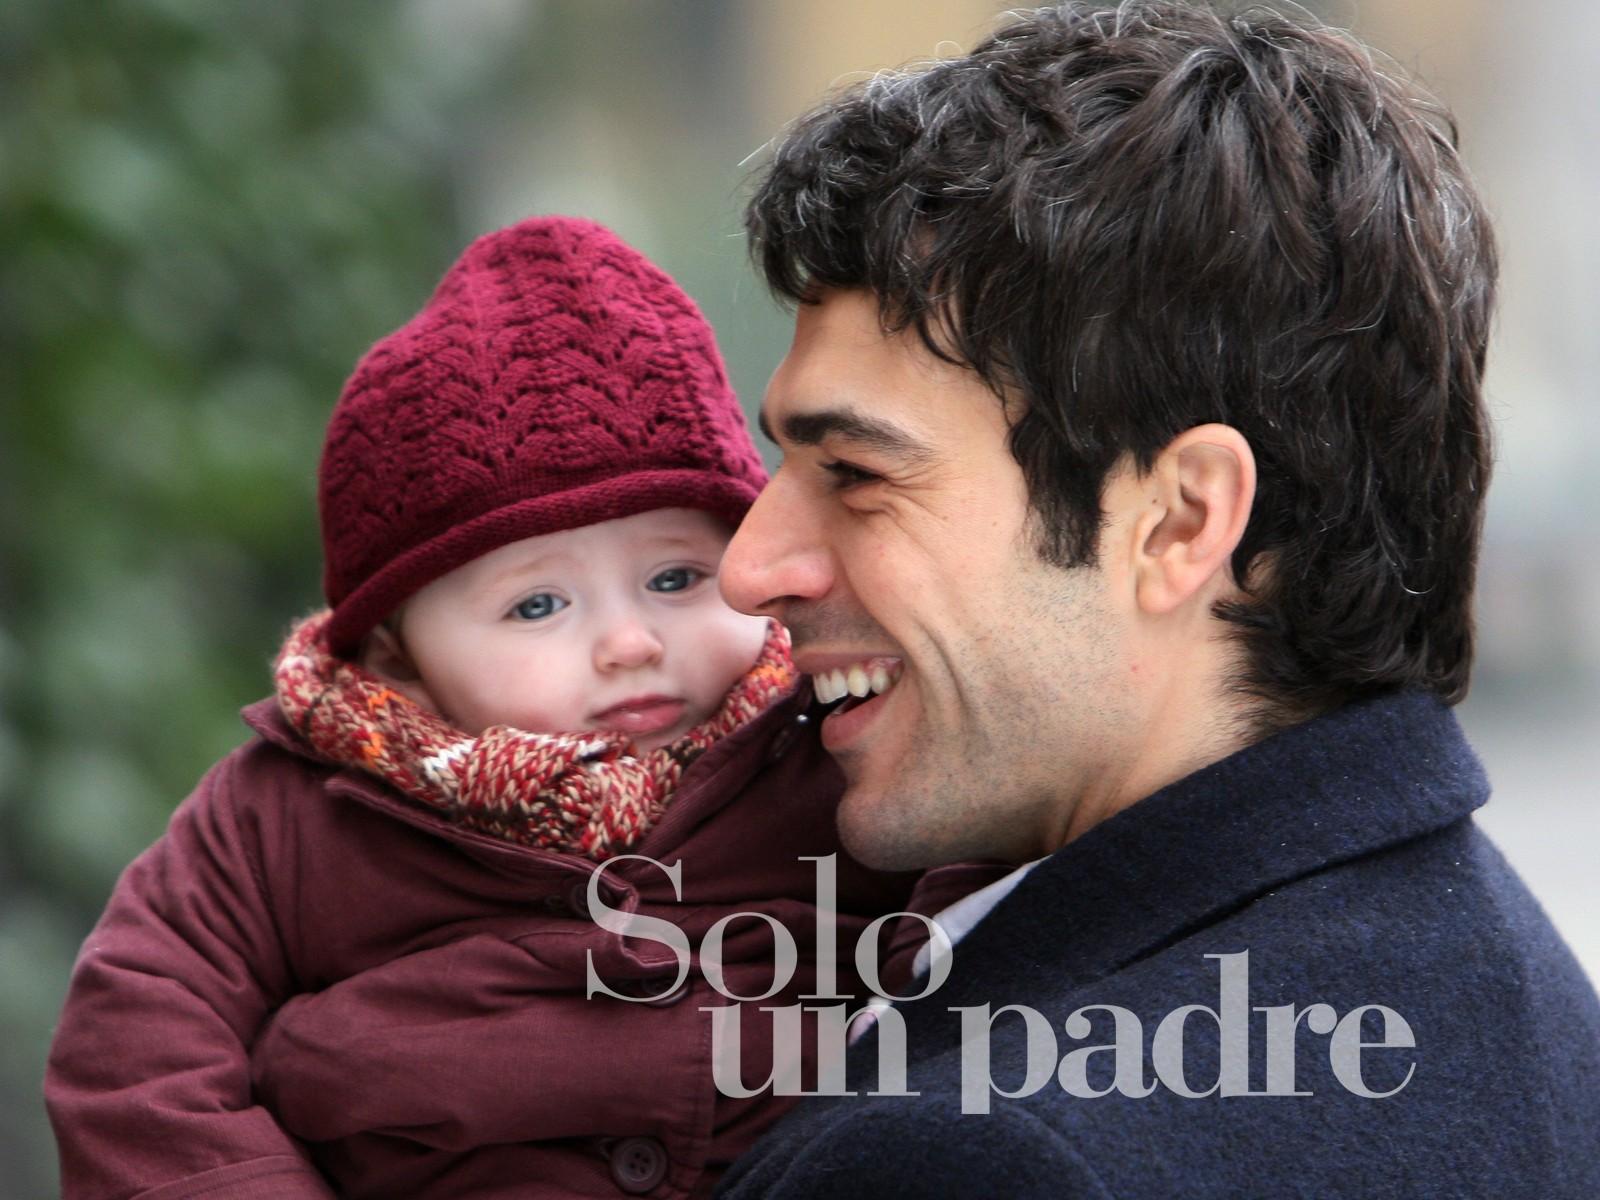 http://2.bp.blogspot.com/_xJJ6_NeBxQk/TIjvRHkvPtI/AAAAAAAAAnw/OCqKrY6QABc/s1600/un-wallpaper-di-solo-un-padre-con-luca-argentero-un-film-di-luca-lucini-97525.jpg